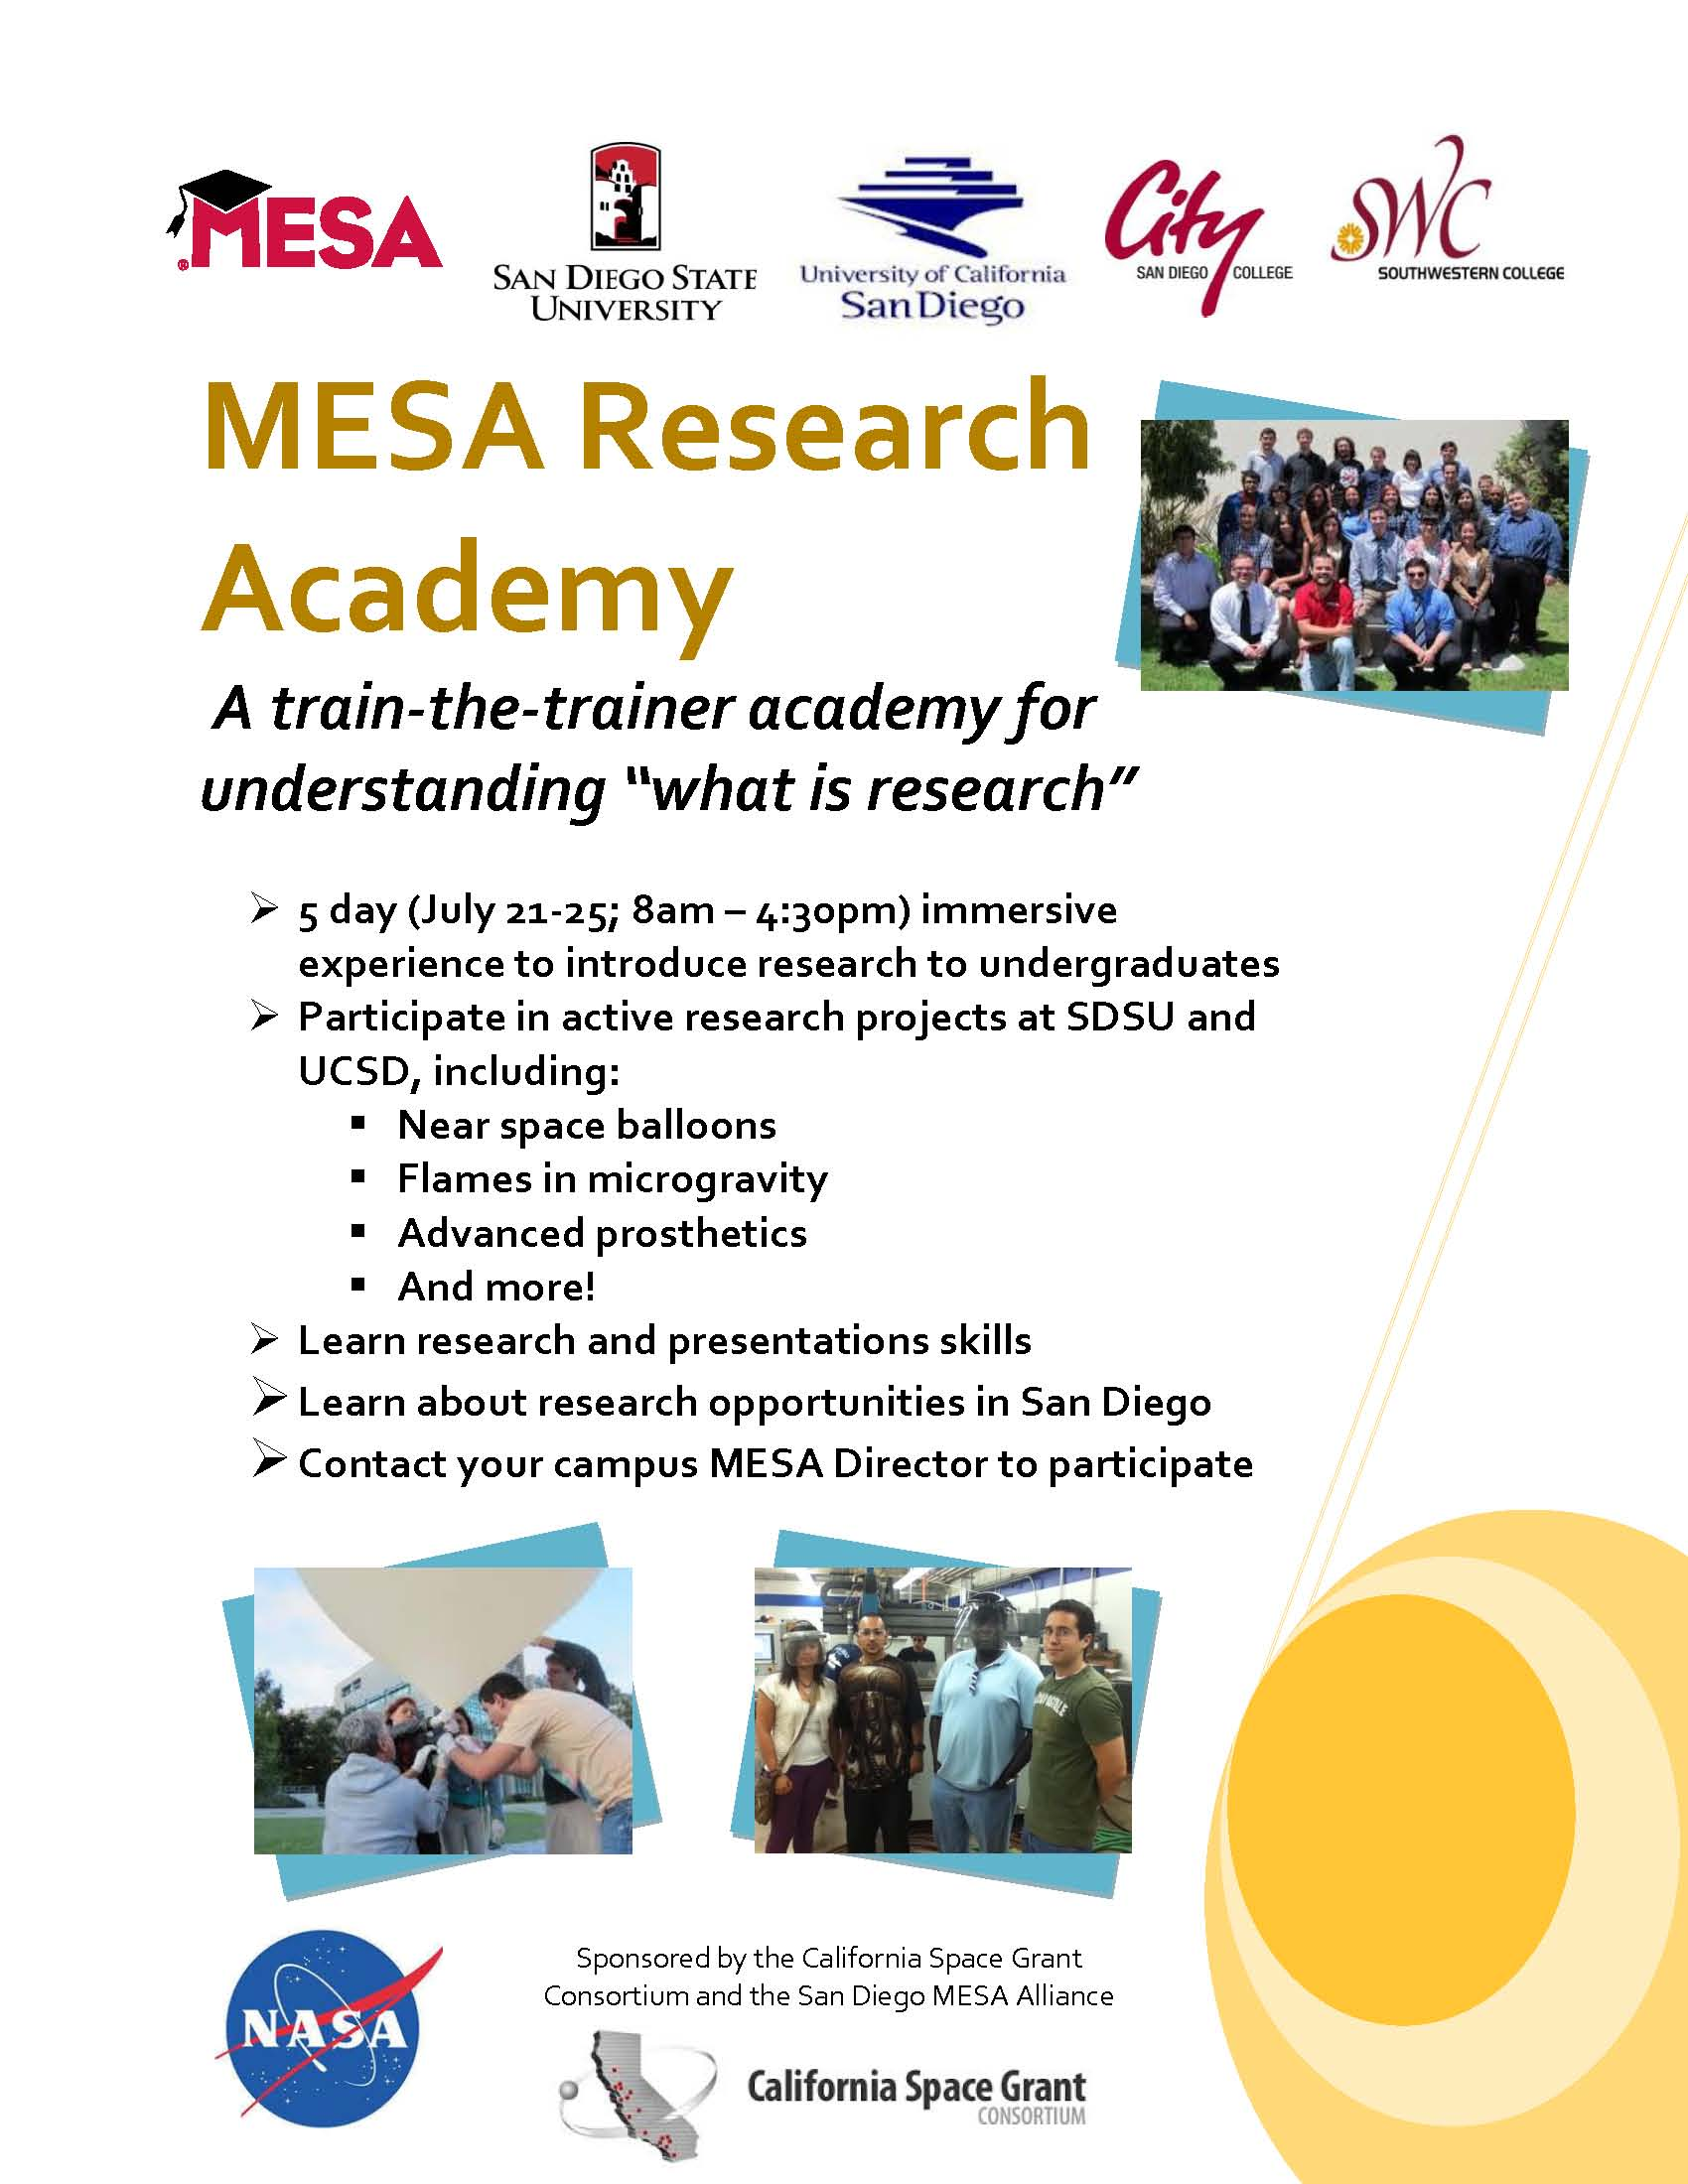 MESA Research Academy flyer